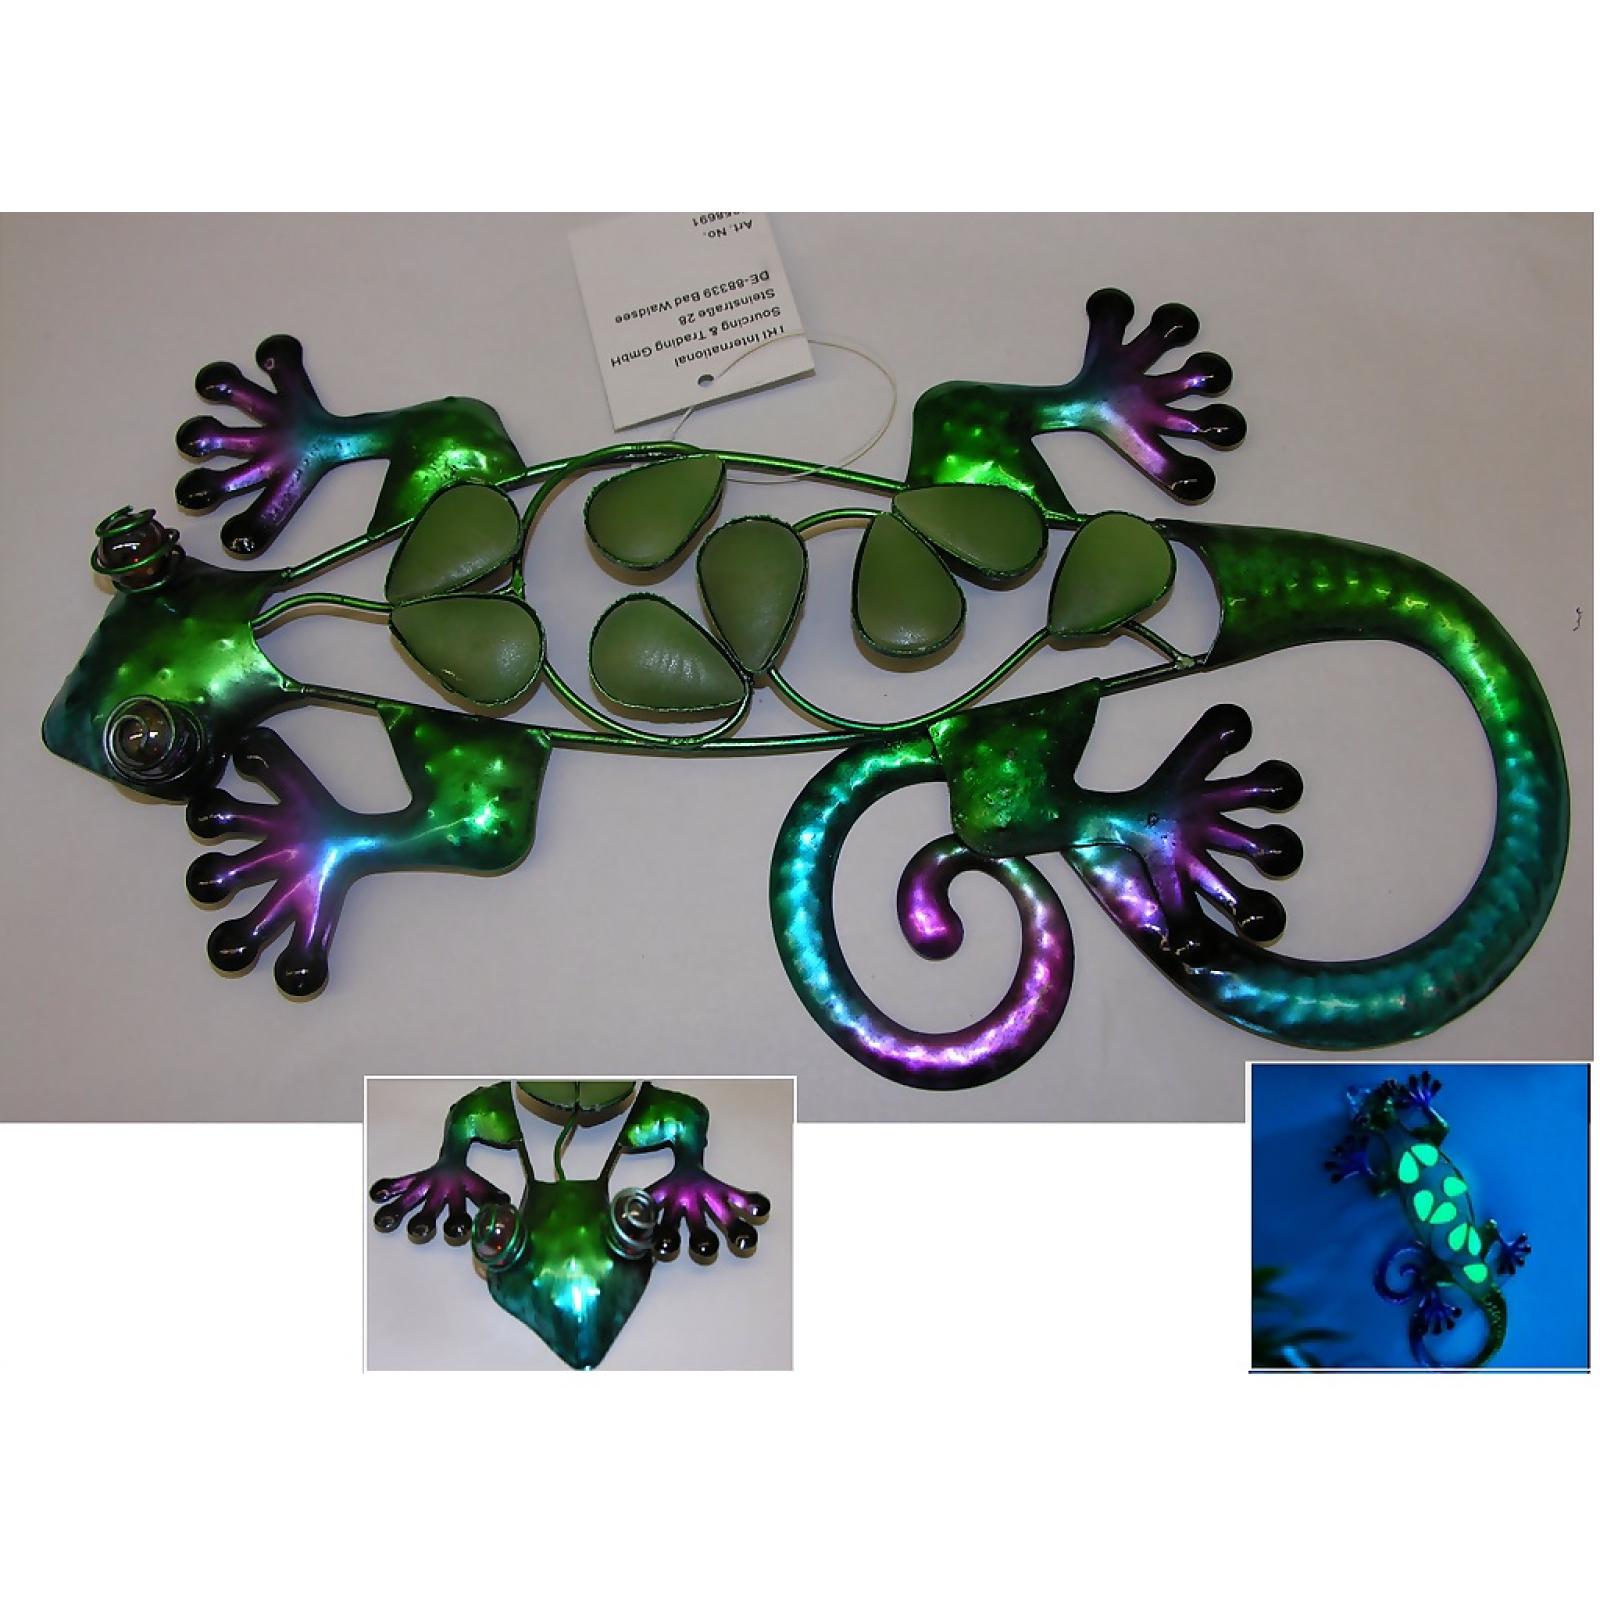 Wanddeko gecko eidechse 30 cm bunt metall glow in the dark garten terrasse ebay - Gecko wanddeko ...